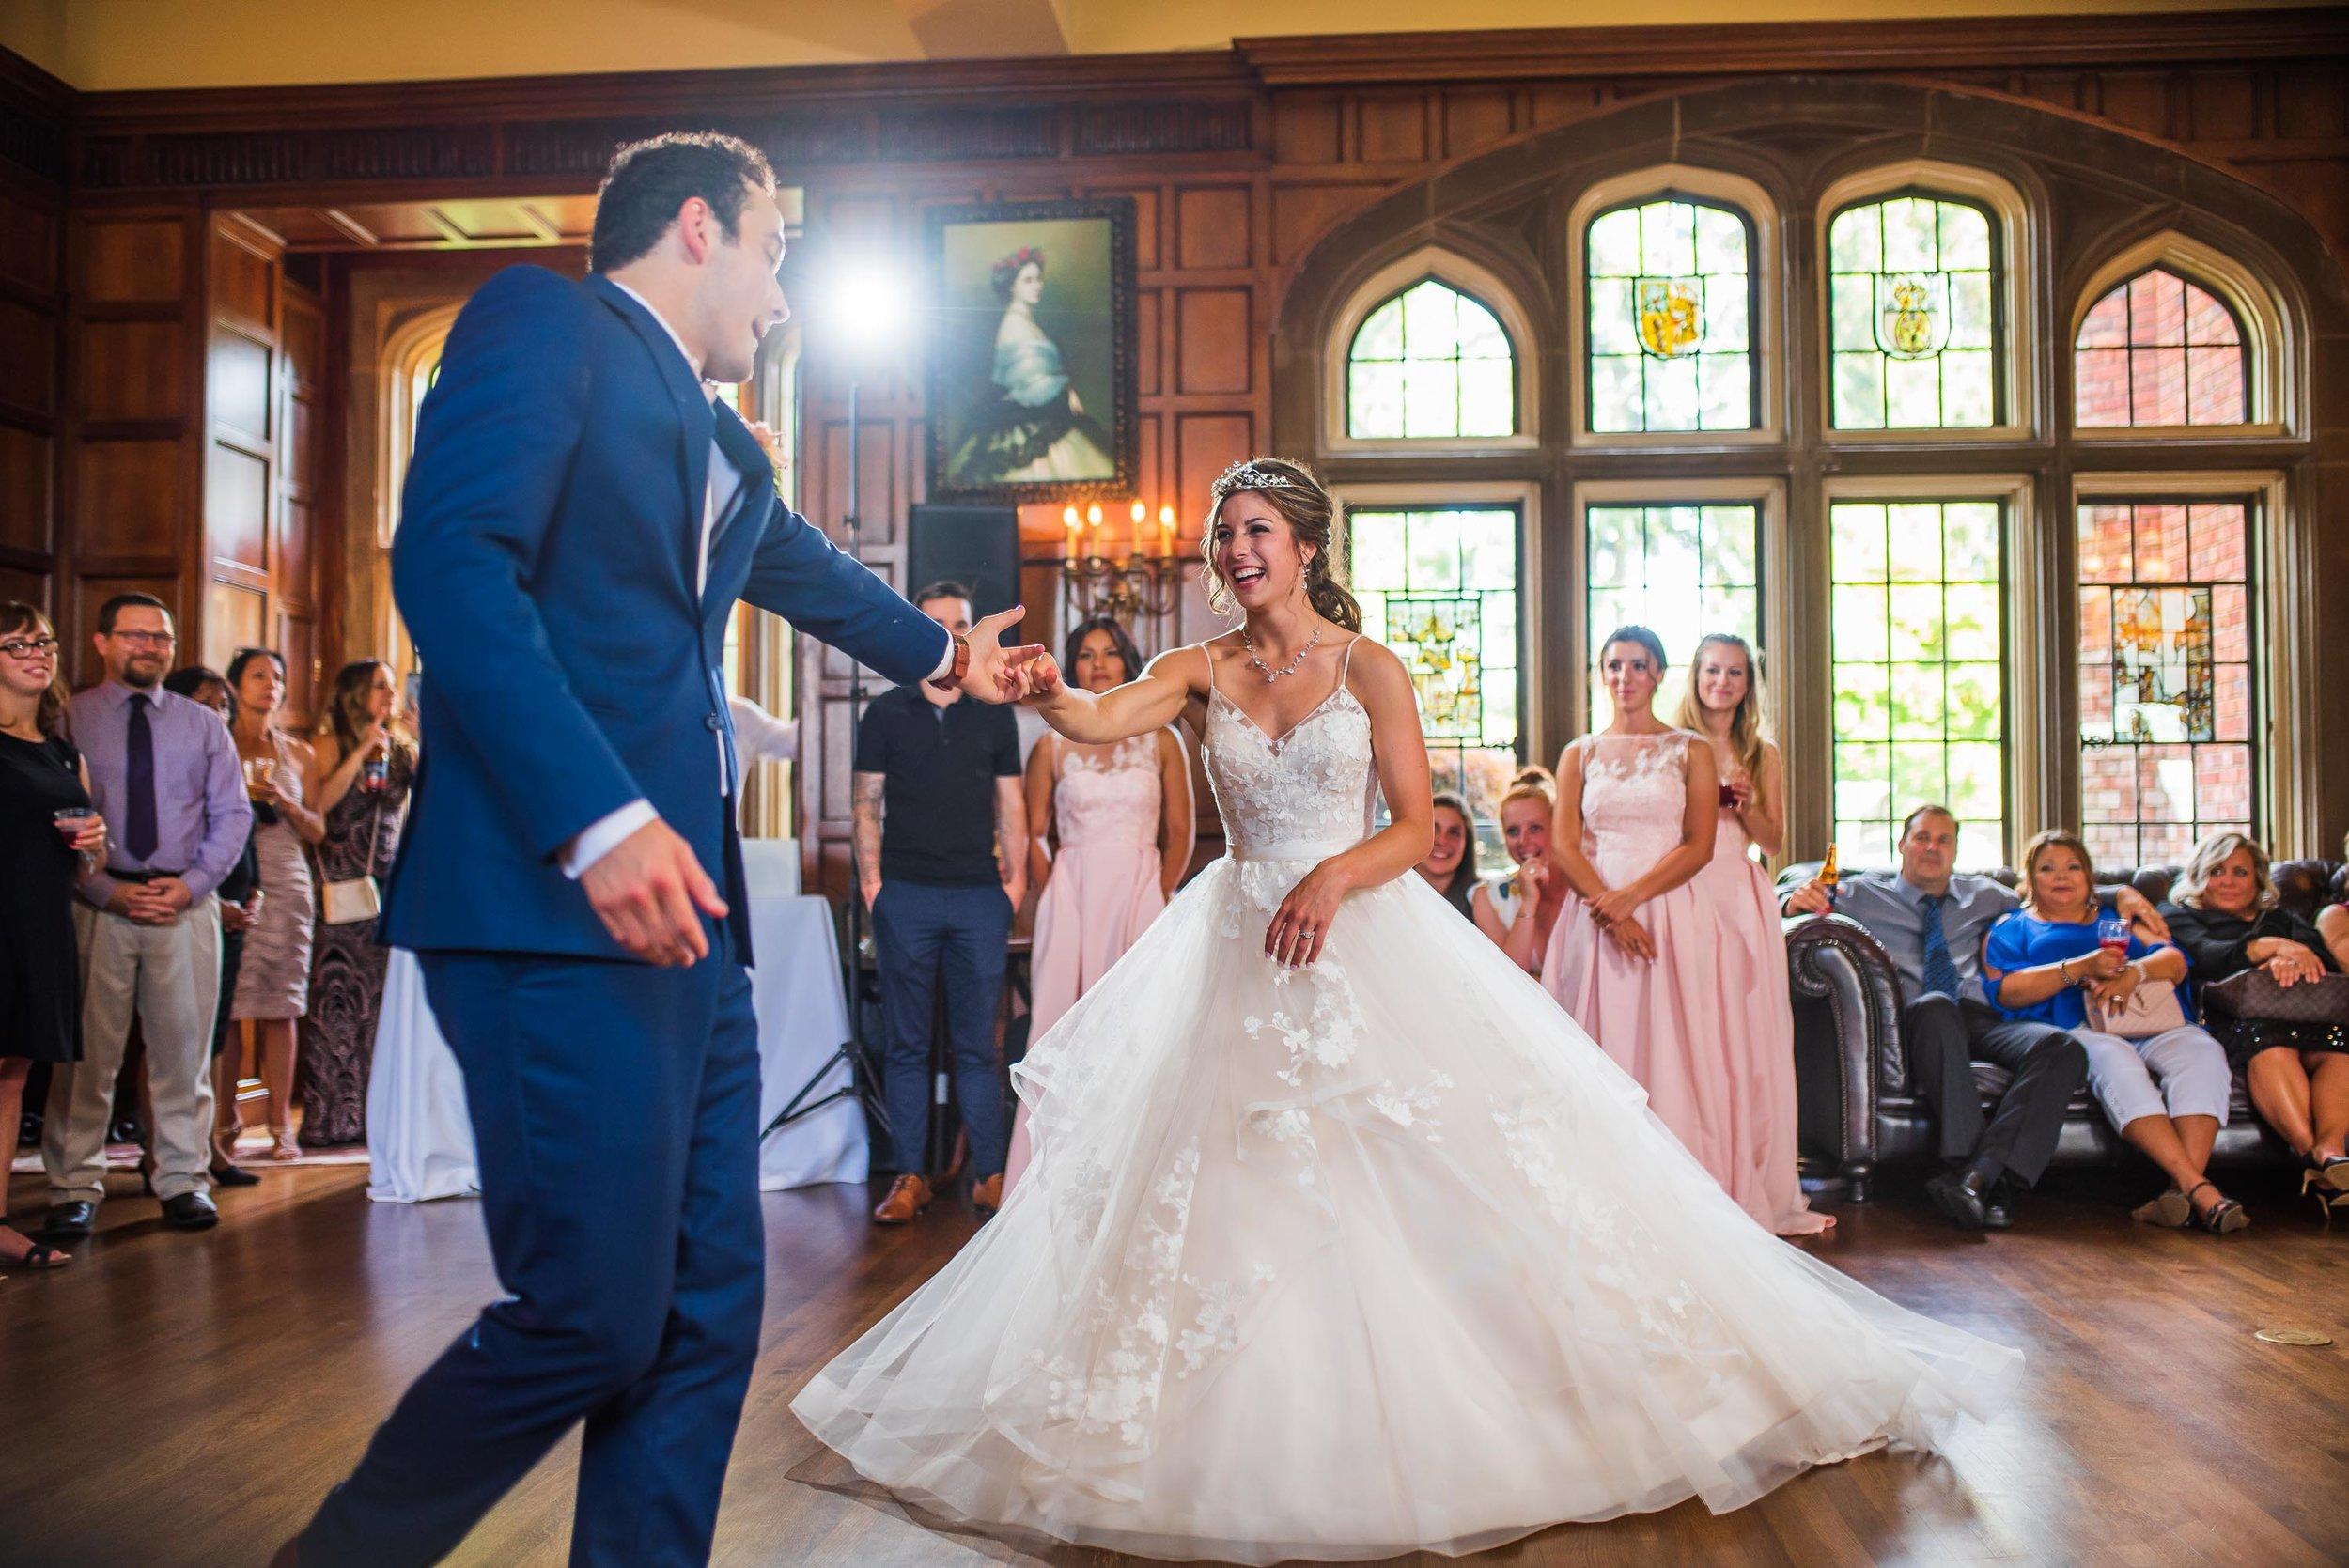 thornewood castle wedding 66.jpg